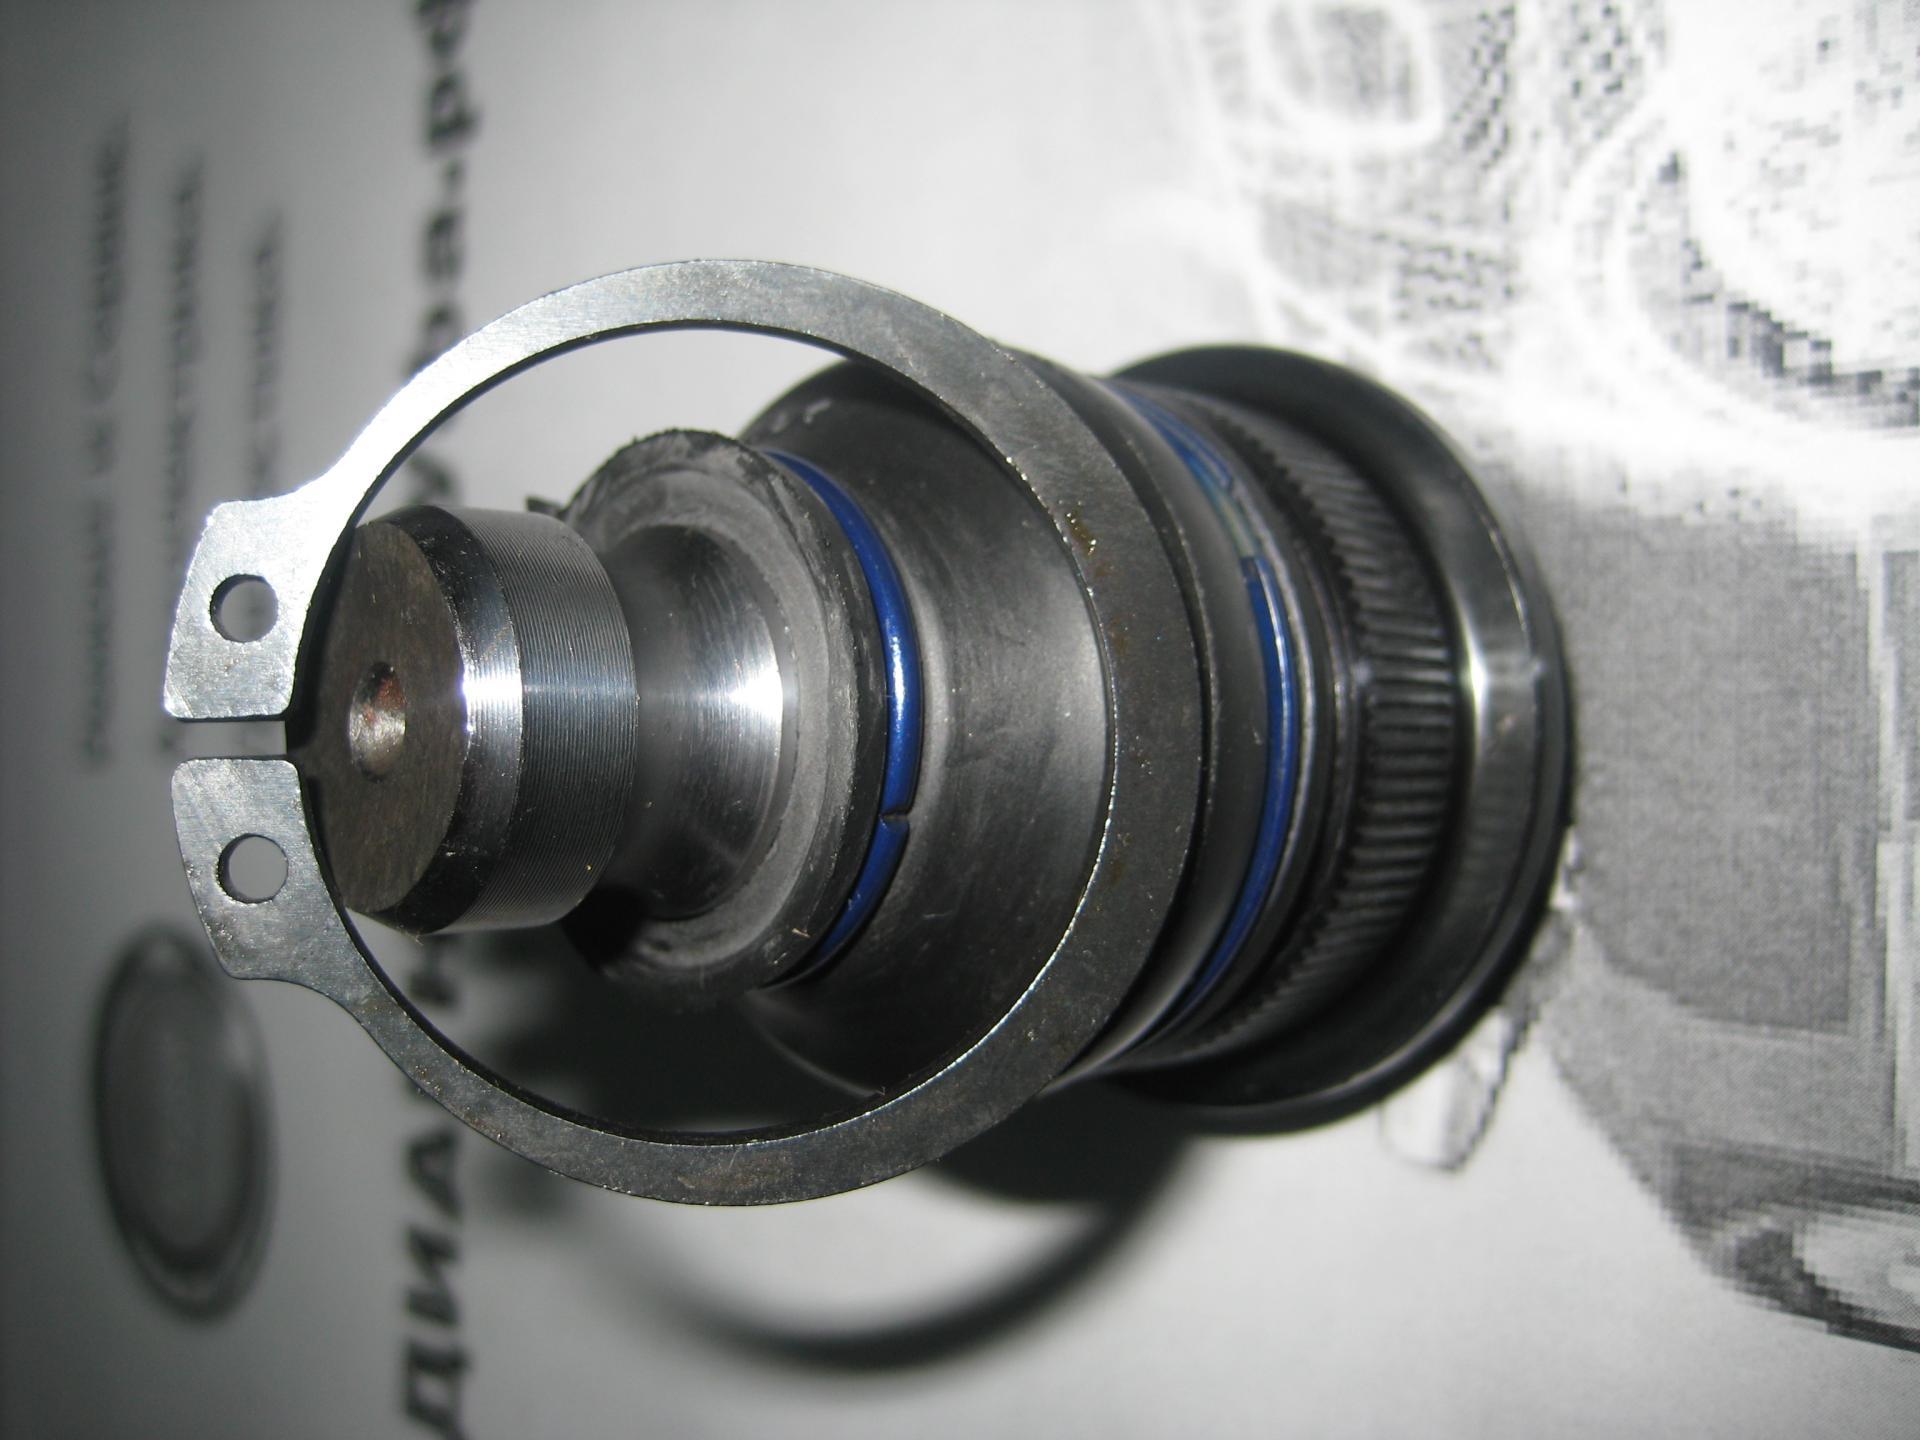 Замена шаровой опоры логан Замена глушителя хендай ах 35